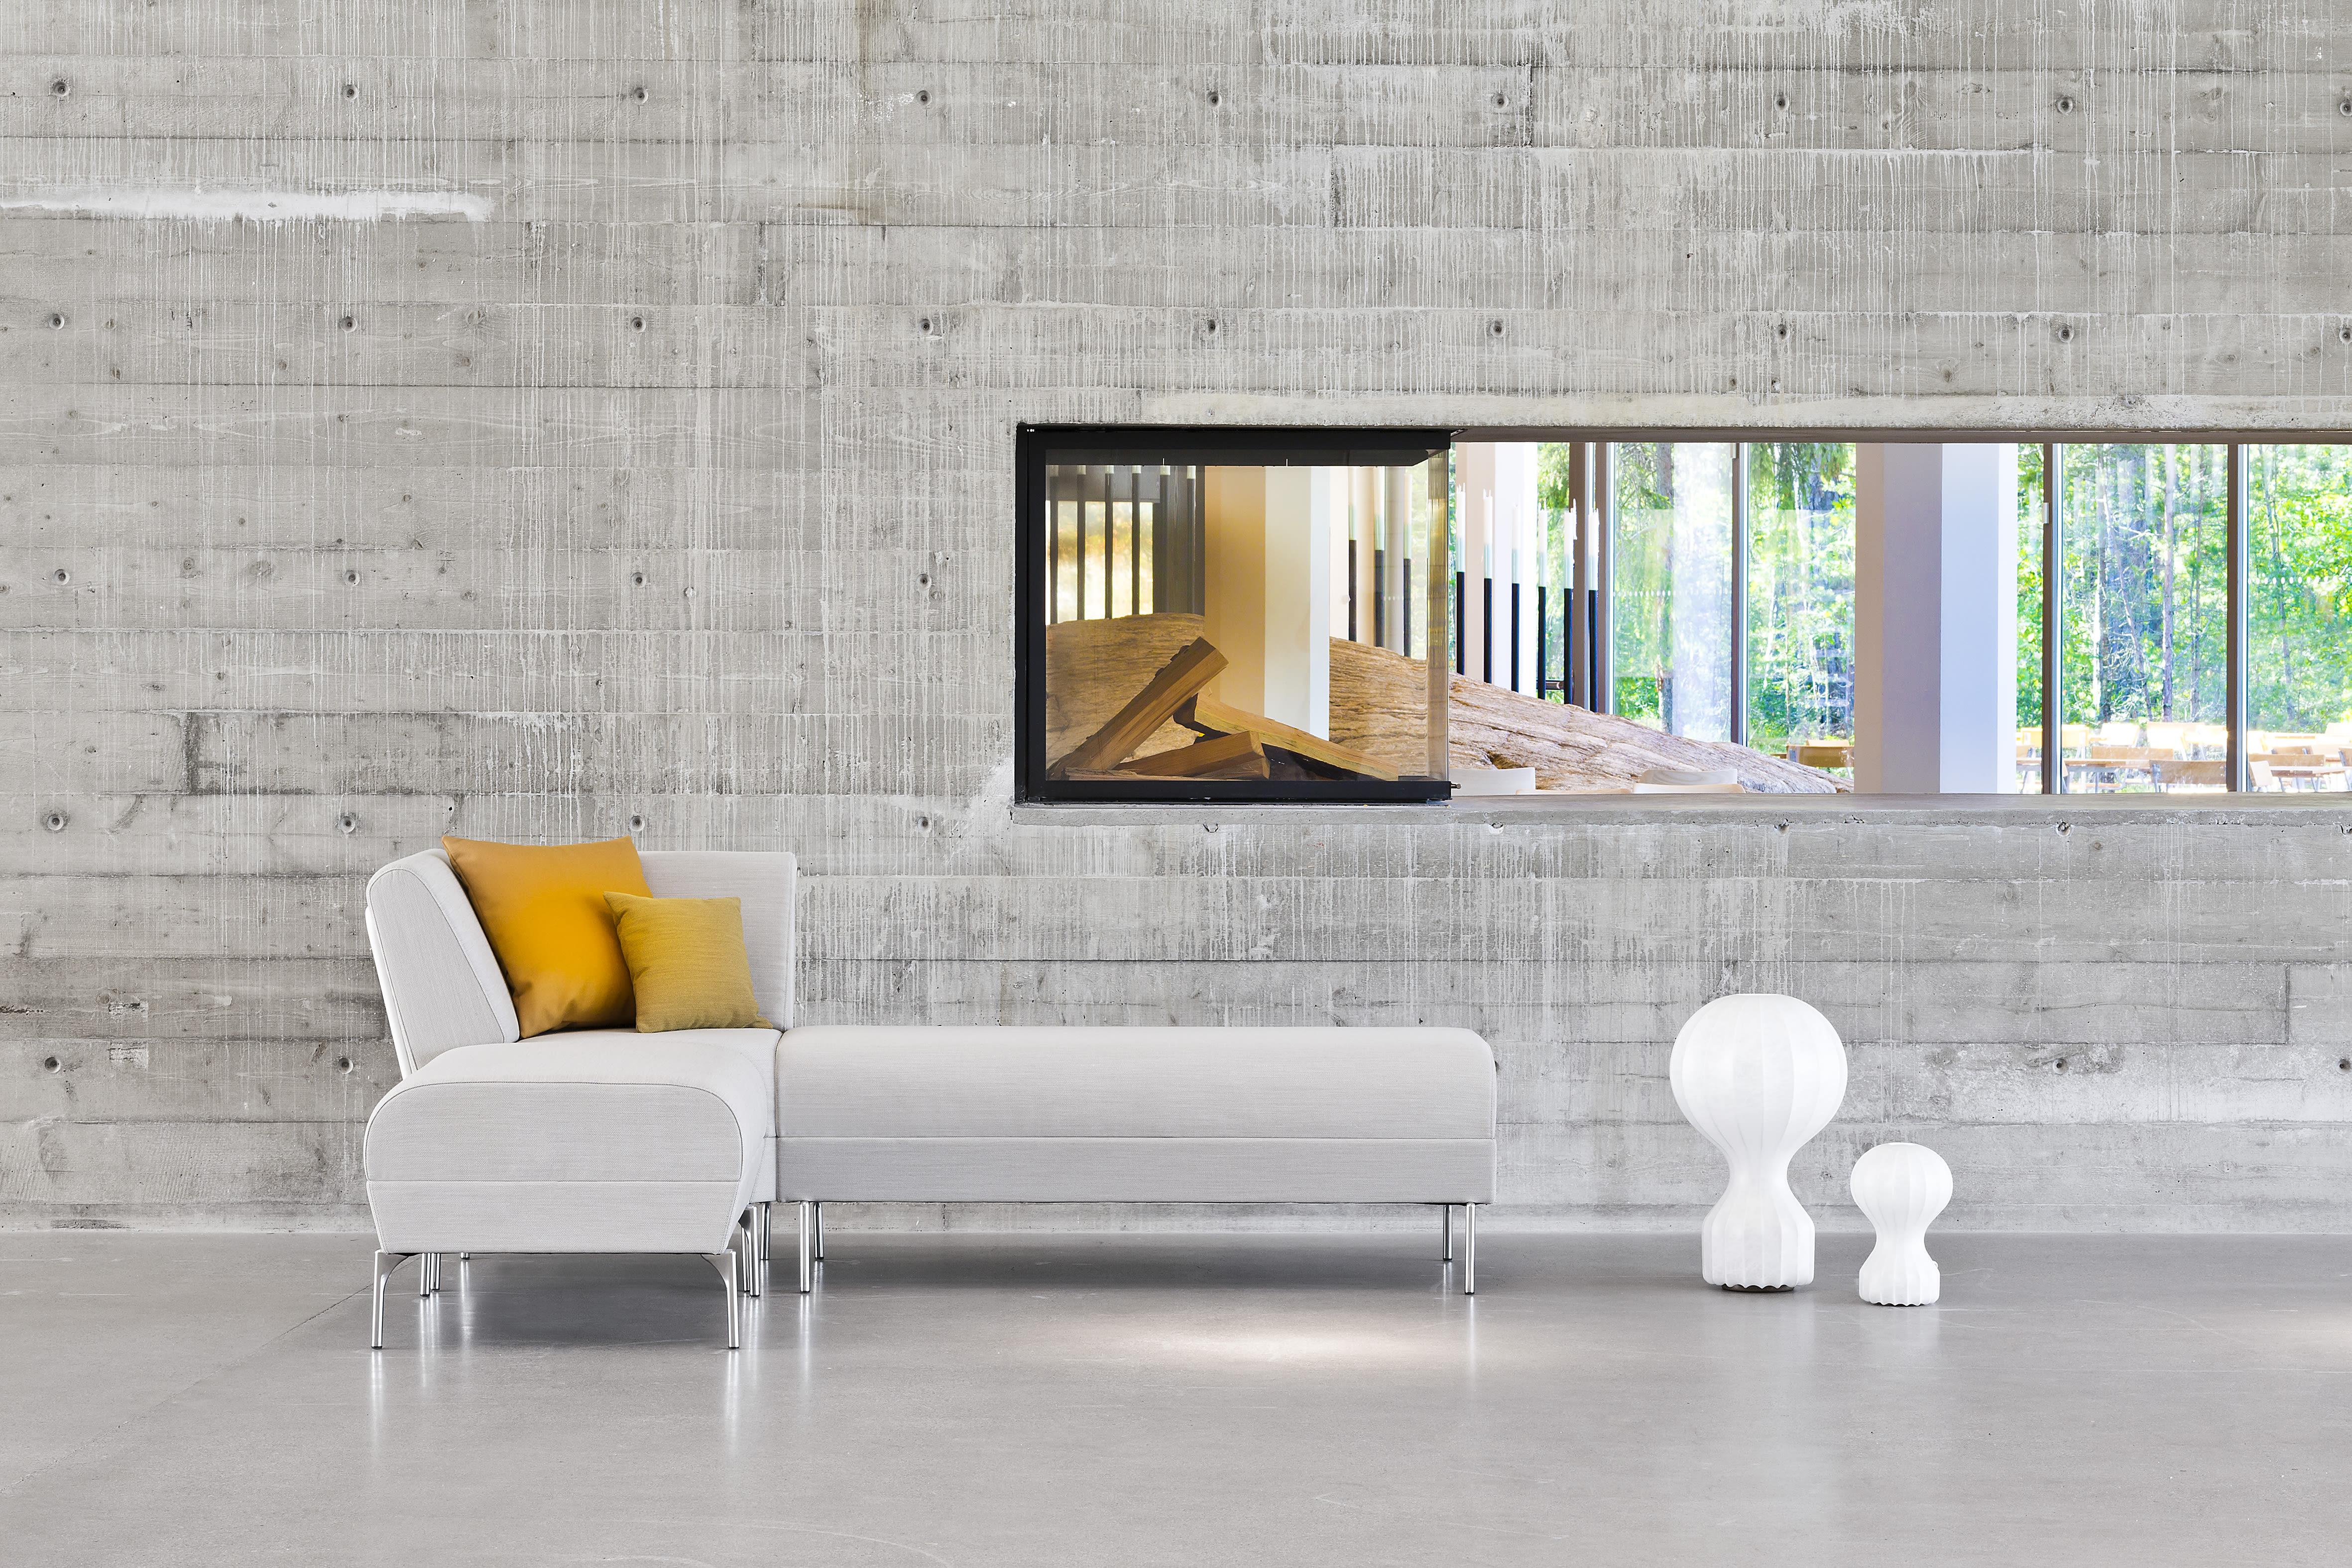 Addit modular sofa Lammhults Möbel AB